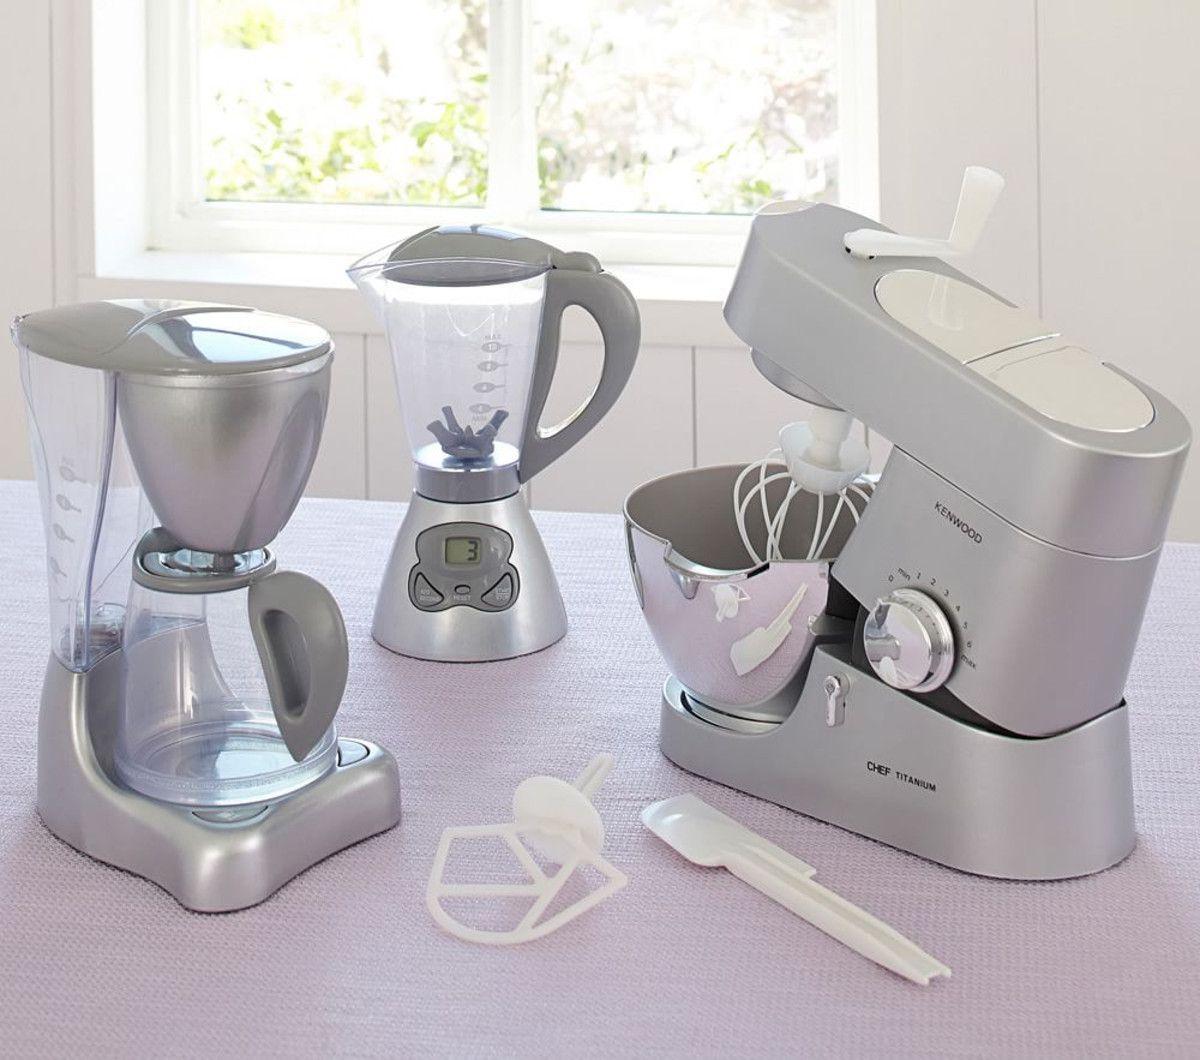 Silver Kitchen Appliances | Kids | Pinterest | Pretend play, Kids ...